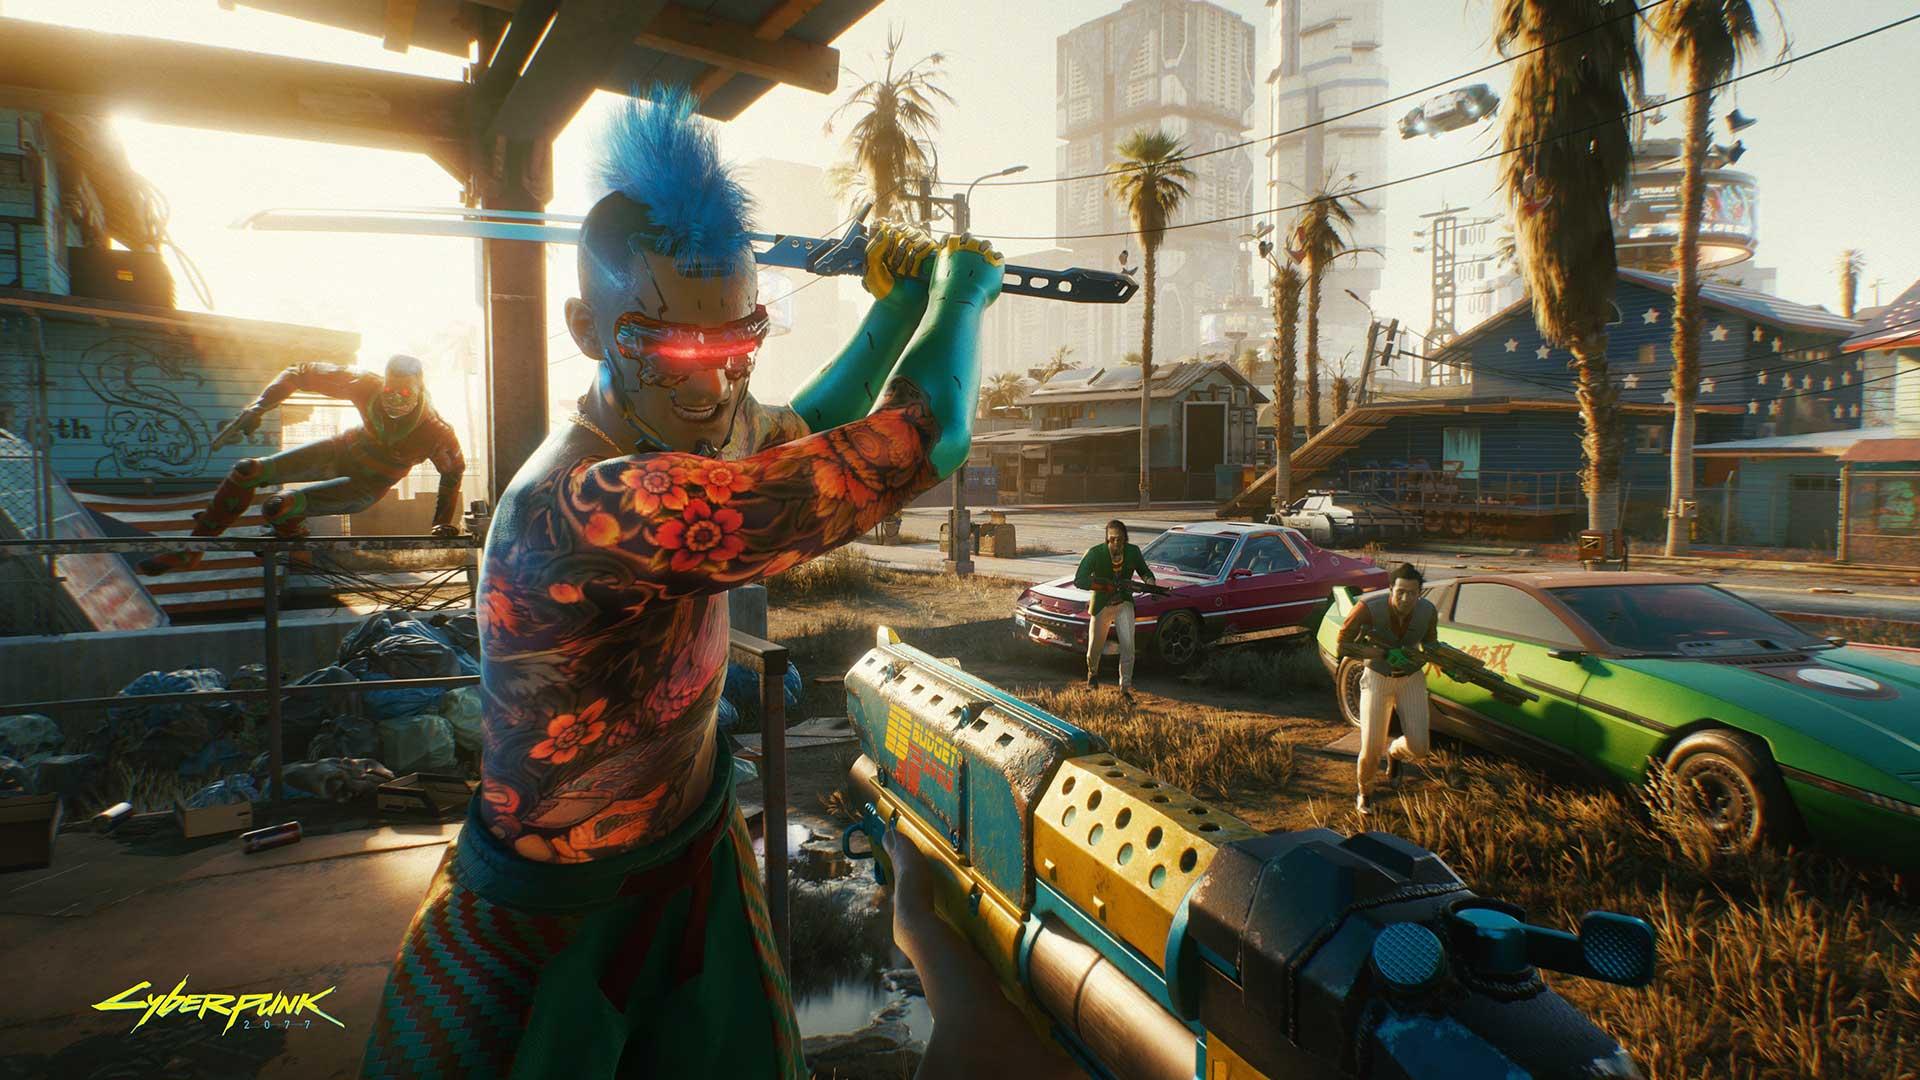 Cyberpunk2077 Always bring a gun to a knife fight RGB en babt